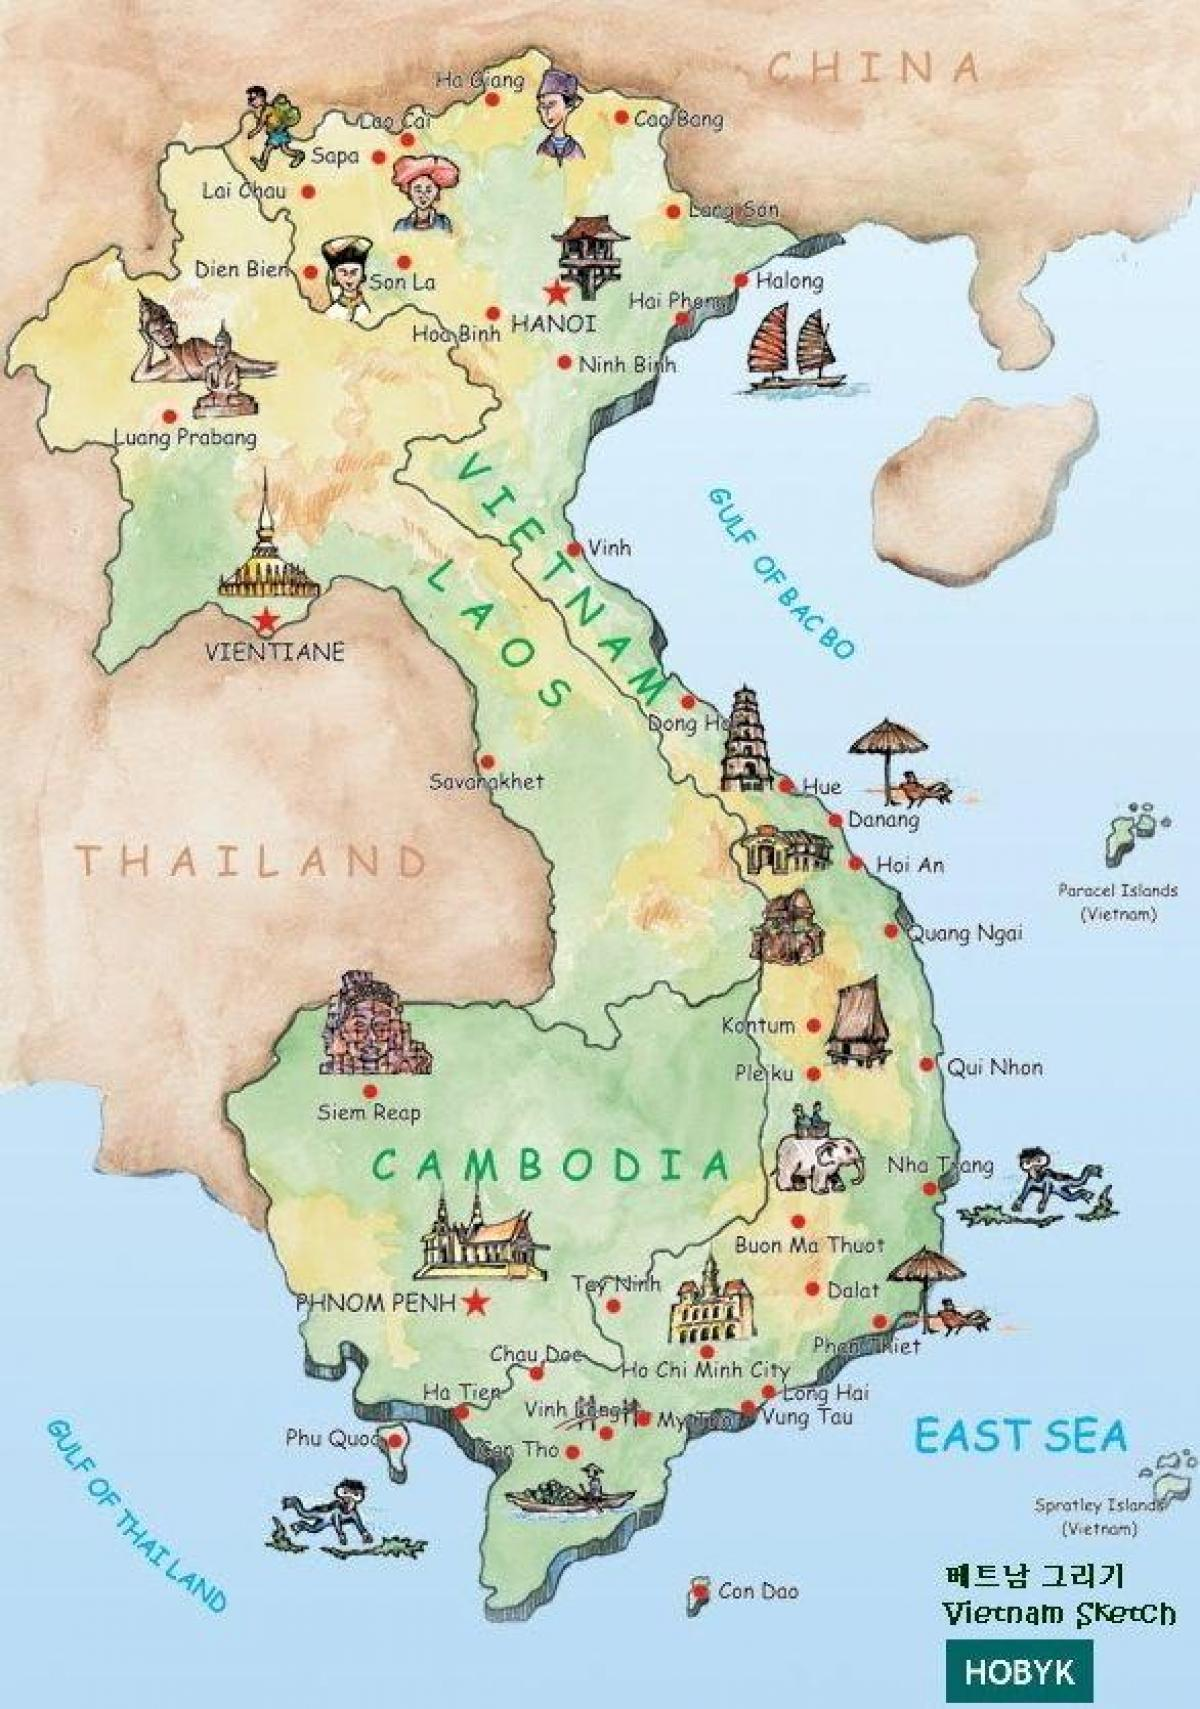 Turist Kort Laos Laos Attraktioner Kort Syd Ostlige Asien Asien